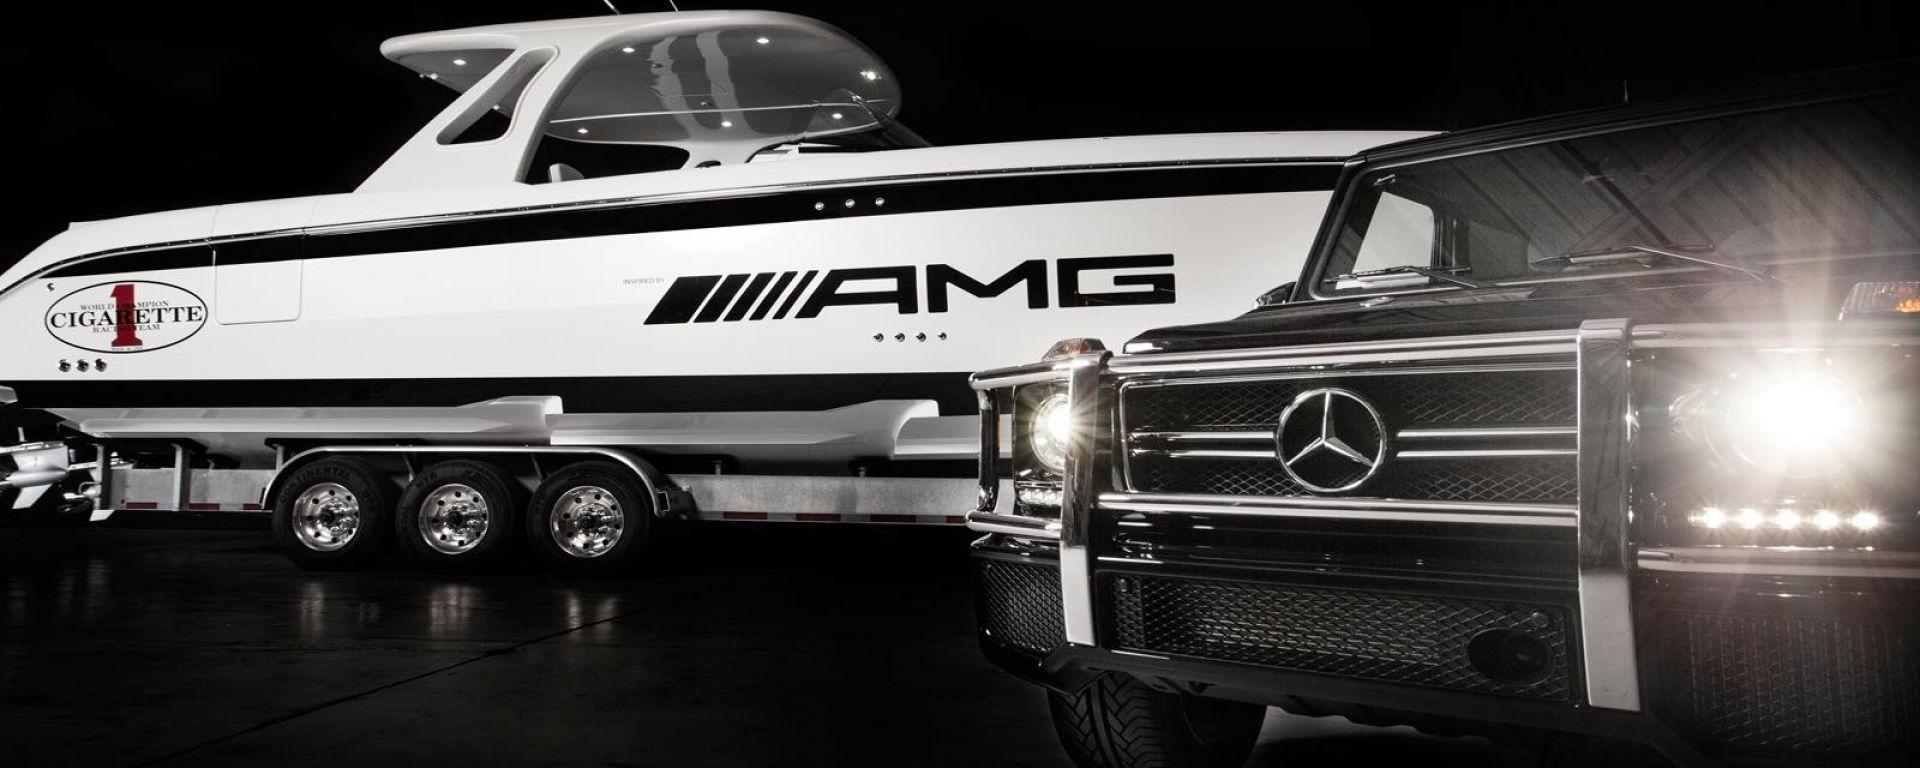 AMG 42 Huntress Cigarette Boat